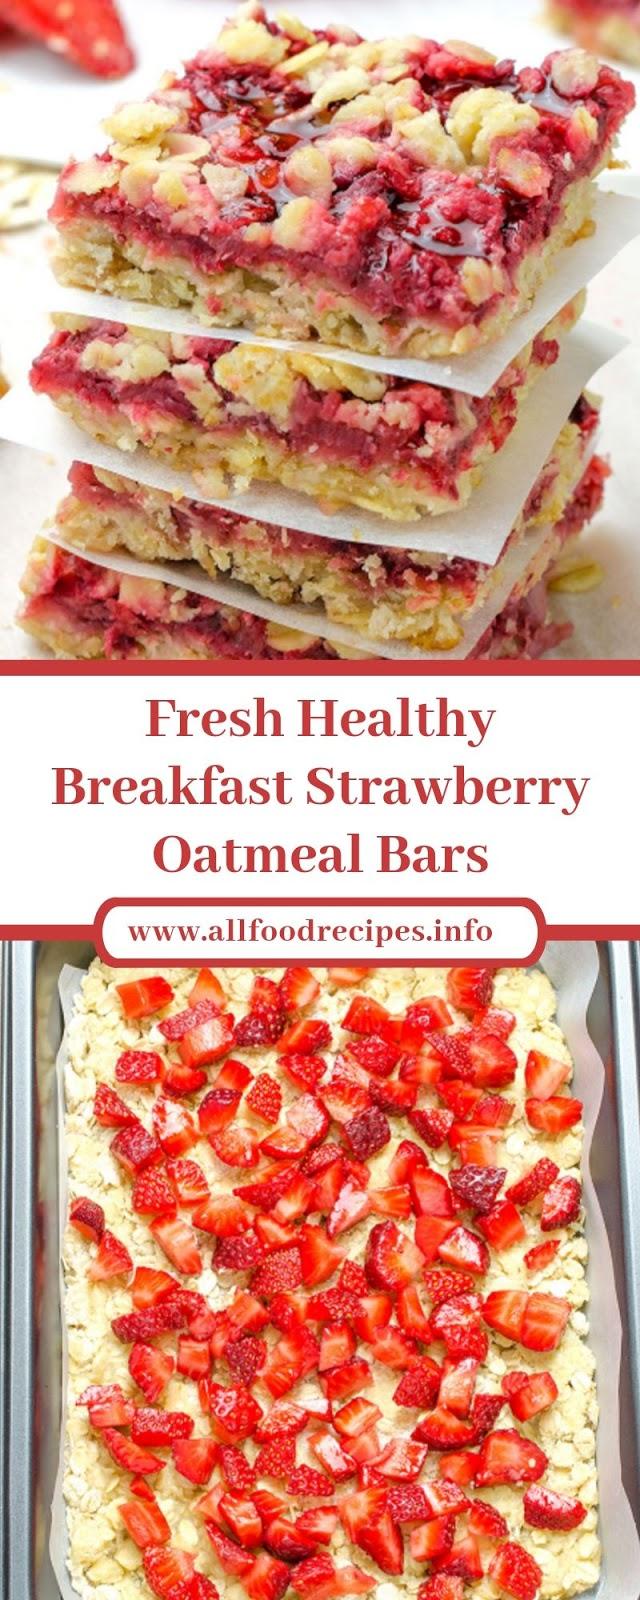 Fresh Healthy Breakfast Strawberry Oatmeal Bars